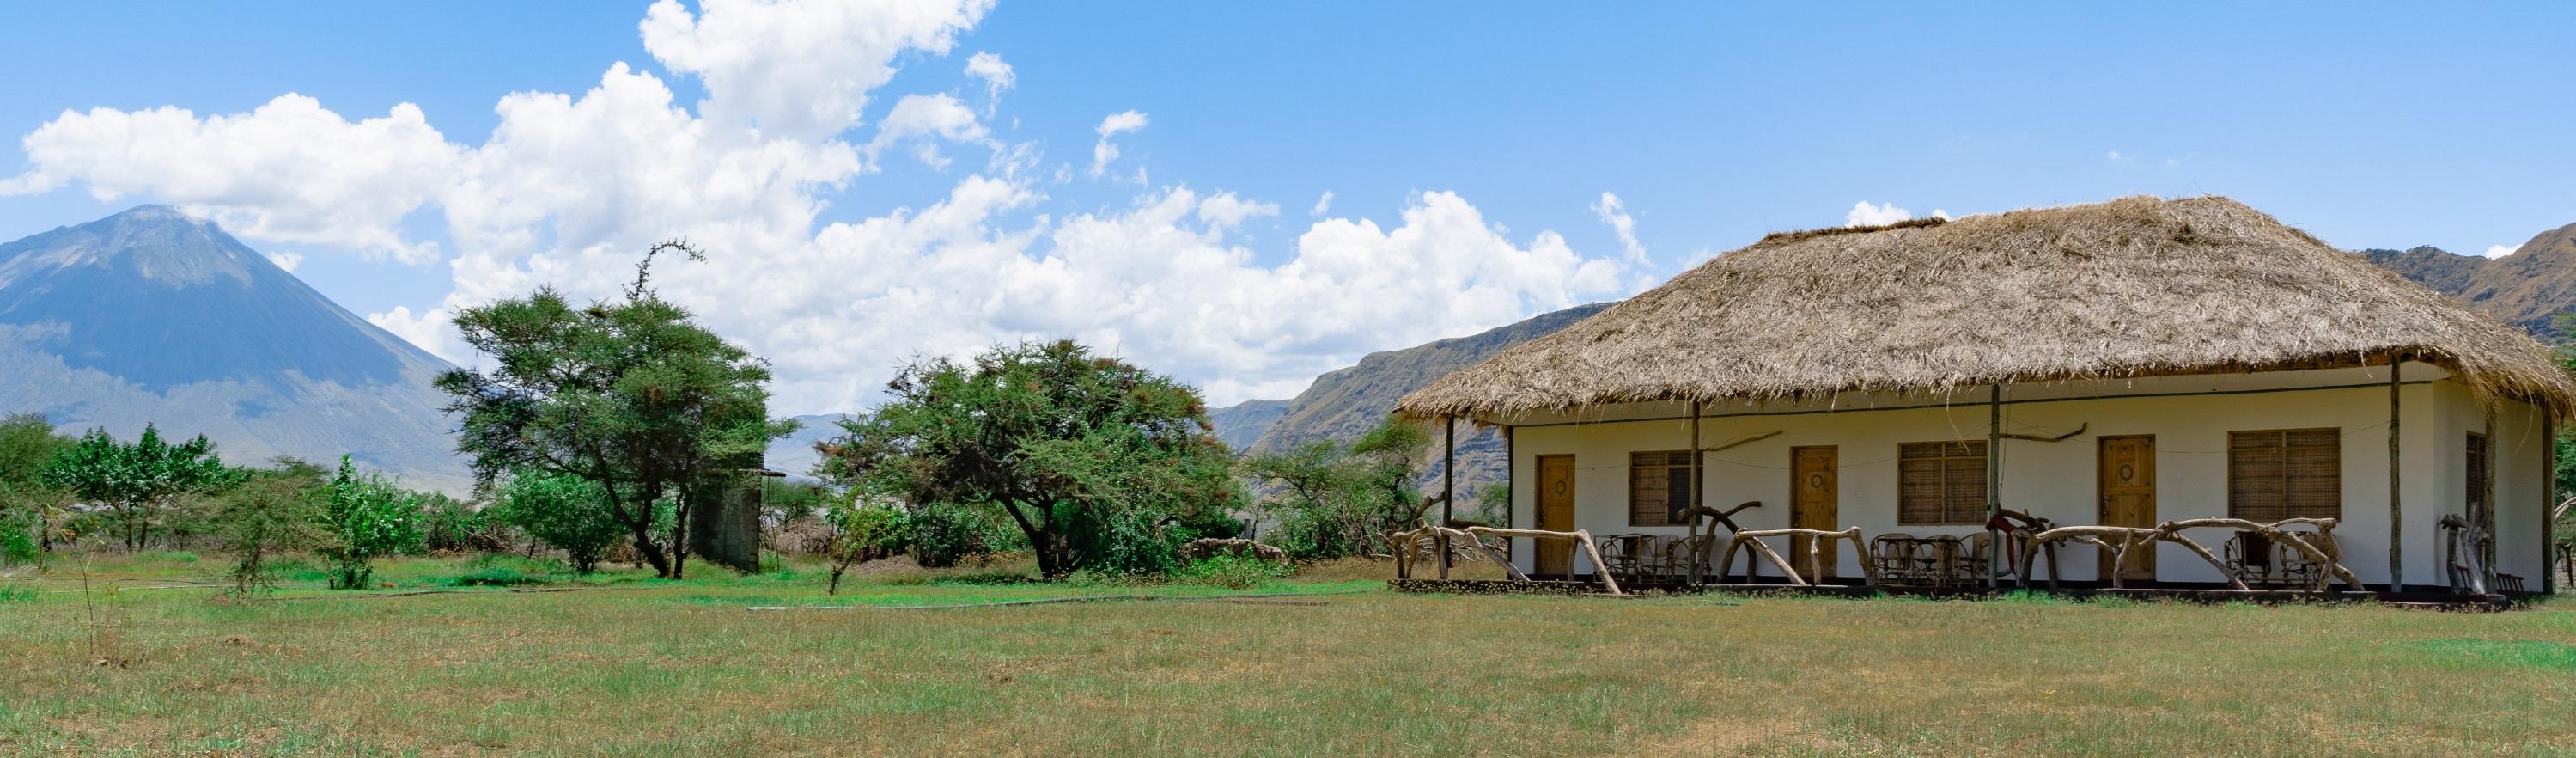 Maasai giraffe eco lodge chambre